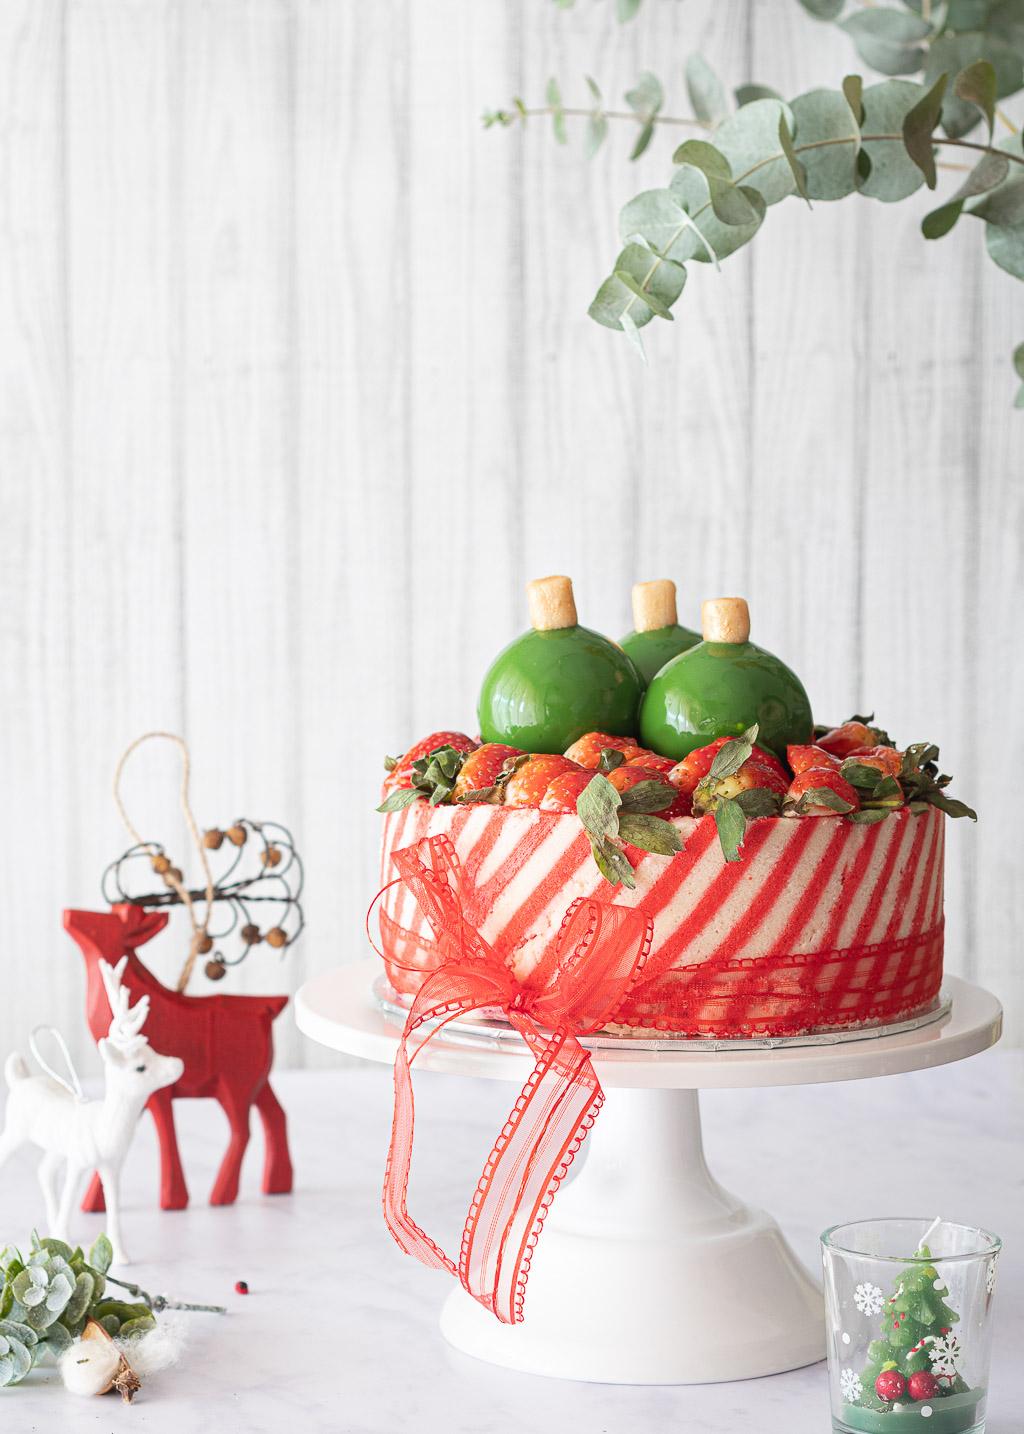 Gâteau de boules de Noël